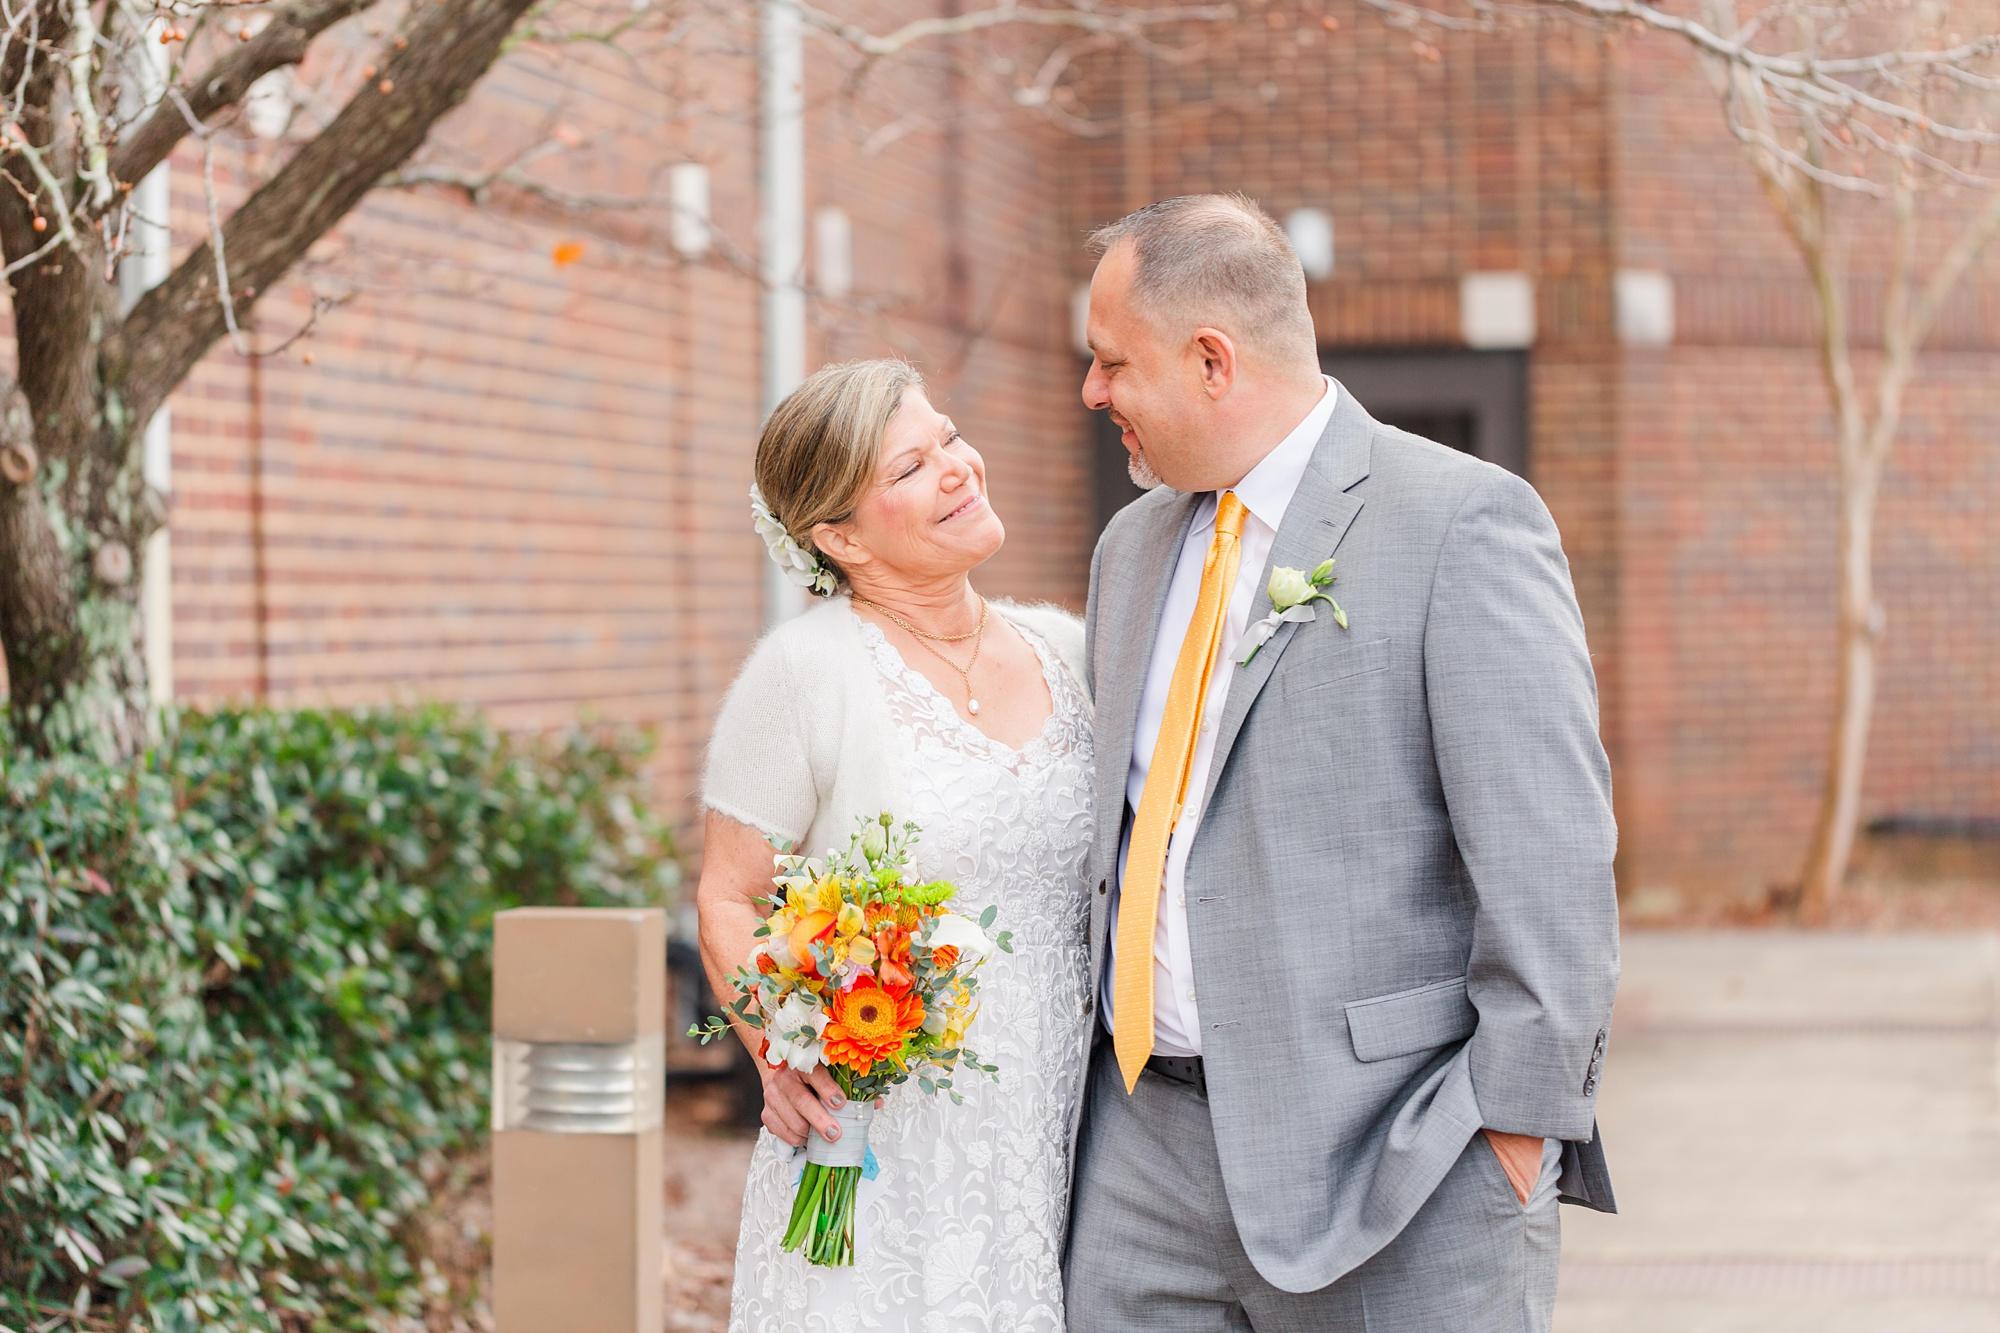 newlyweds hug on sidewalk in Mobile Alabama